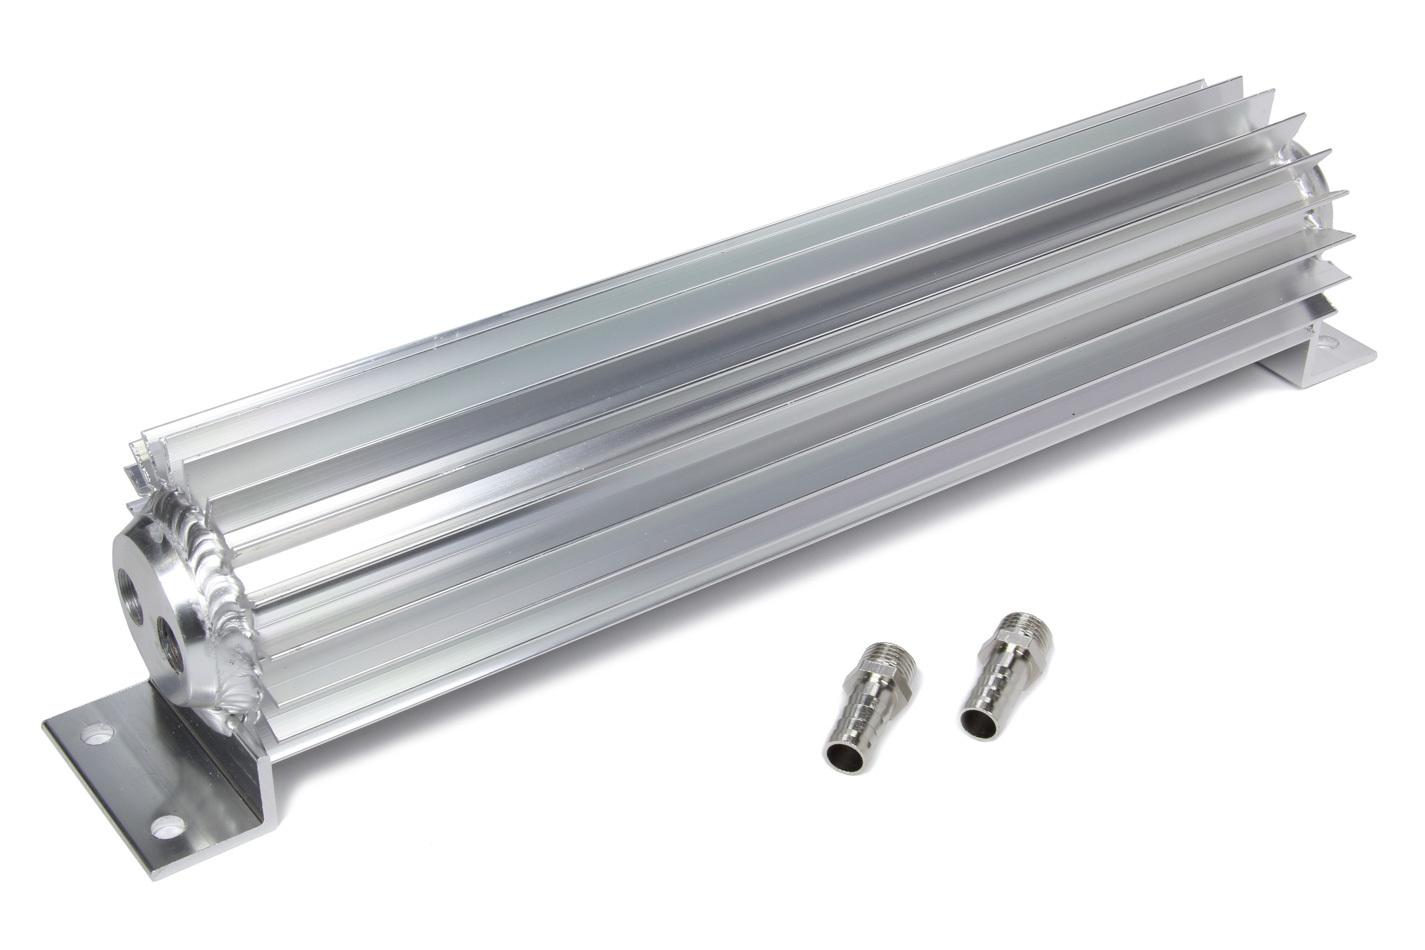 Dual Pass Transmission Cooler Aluminum